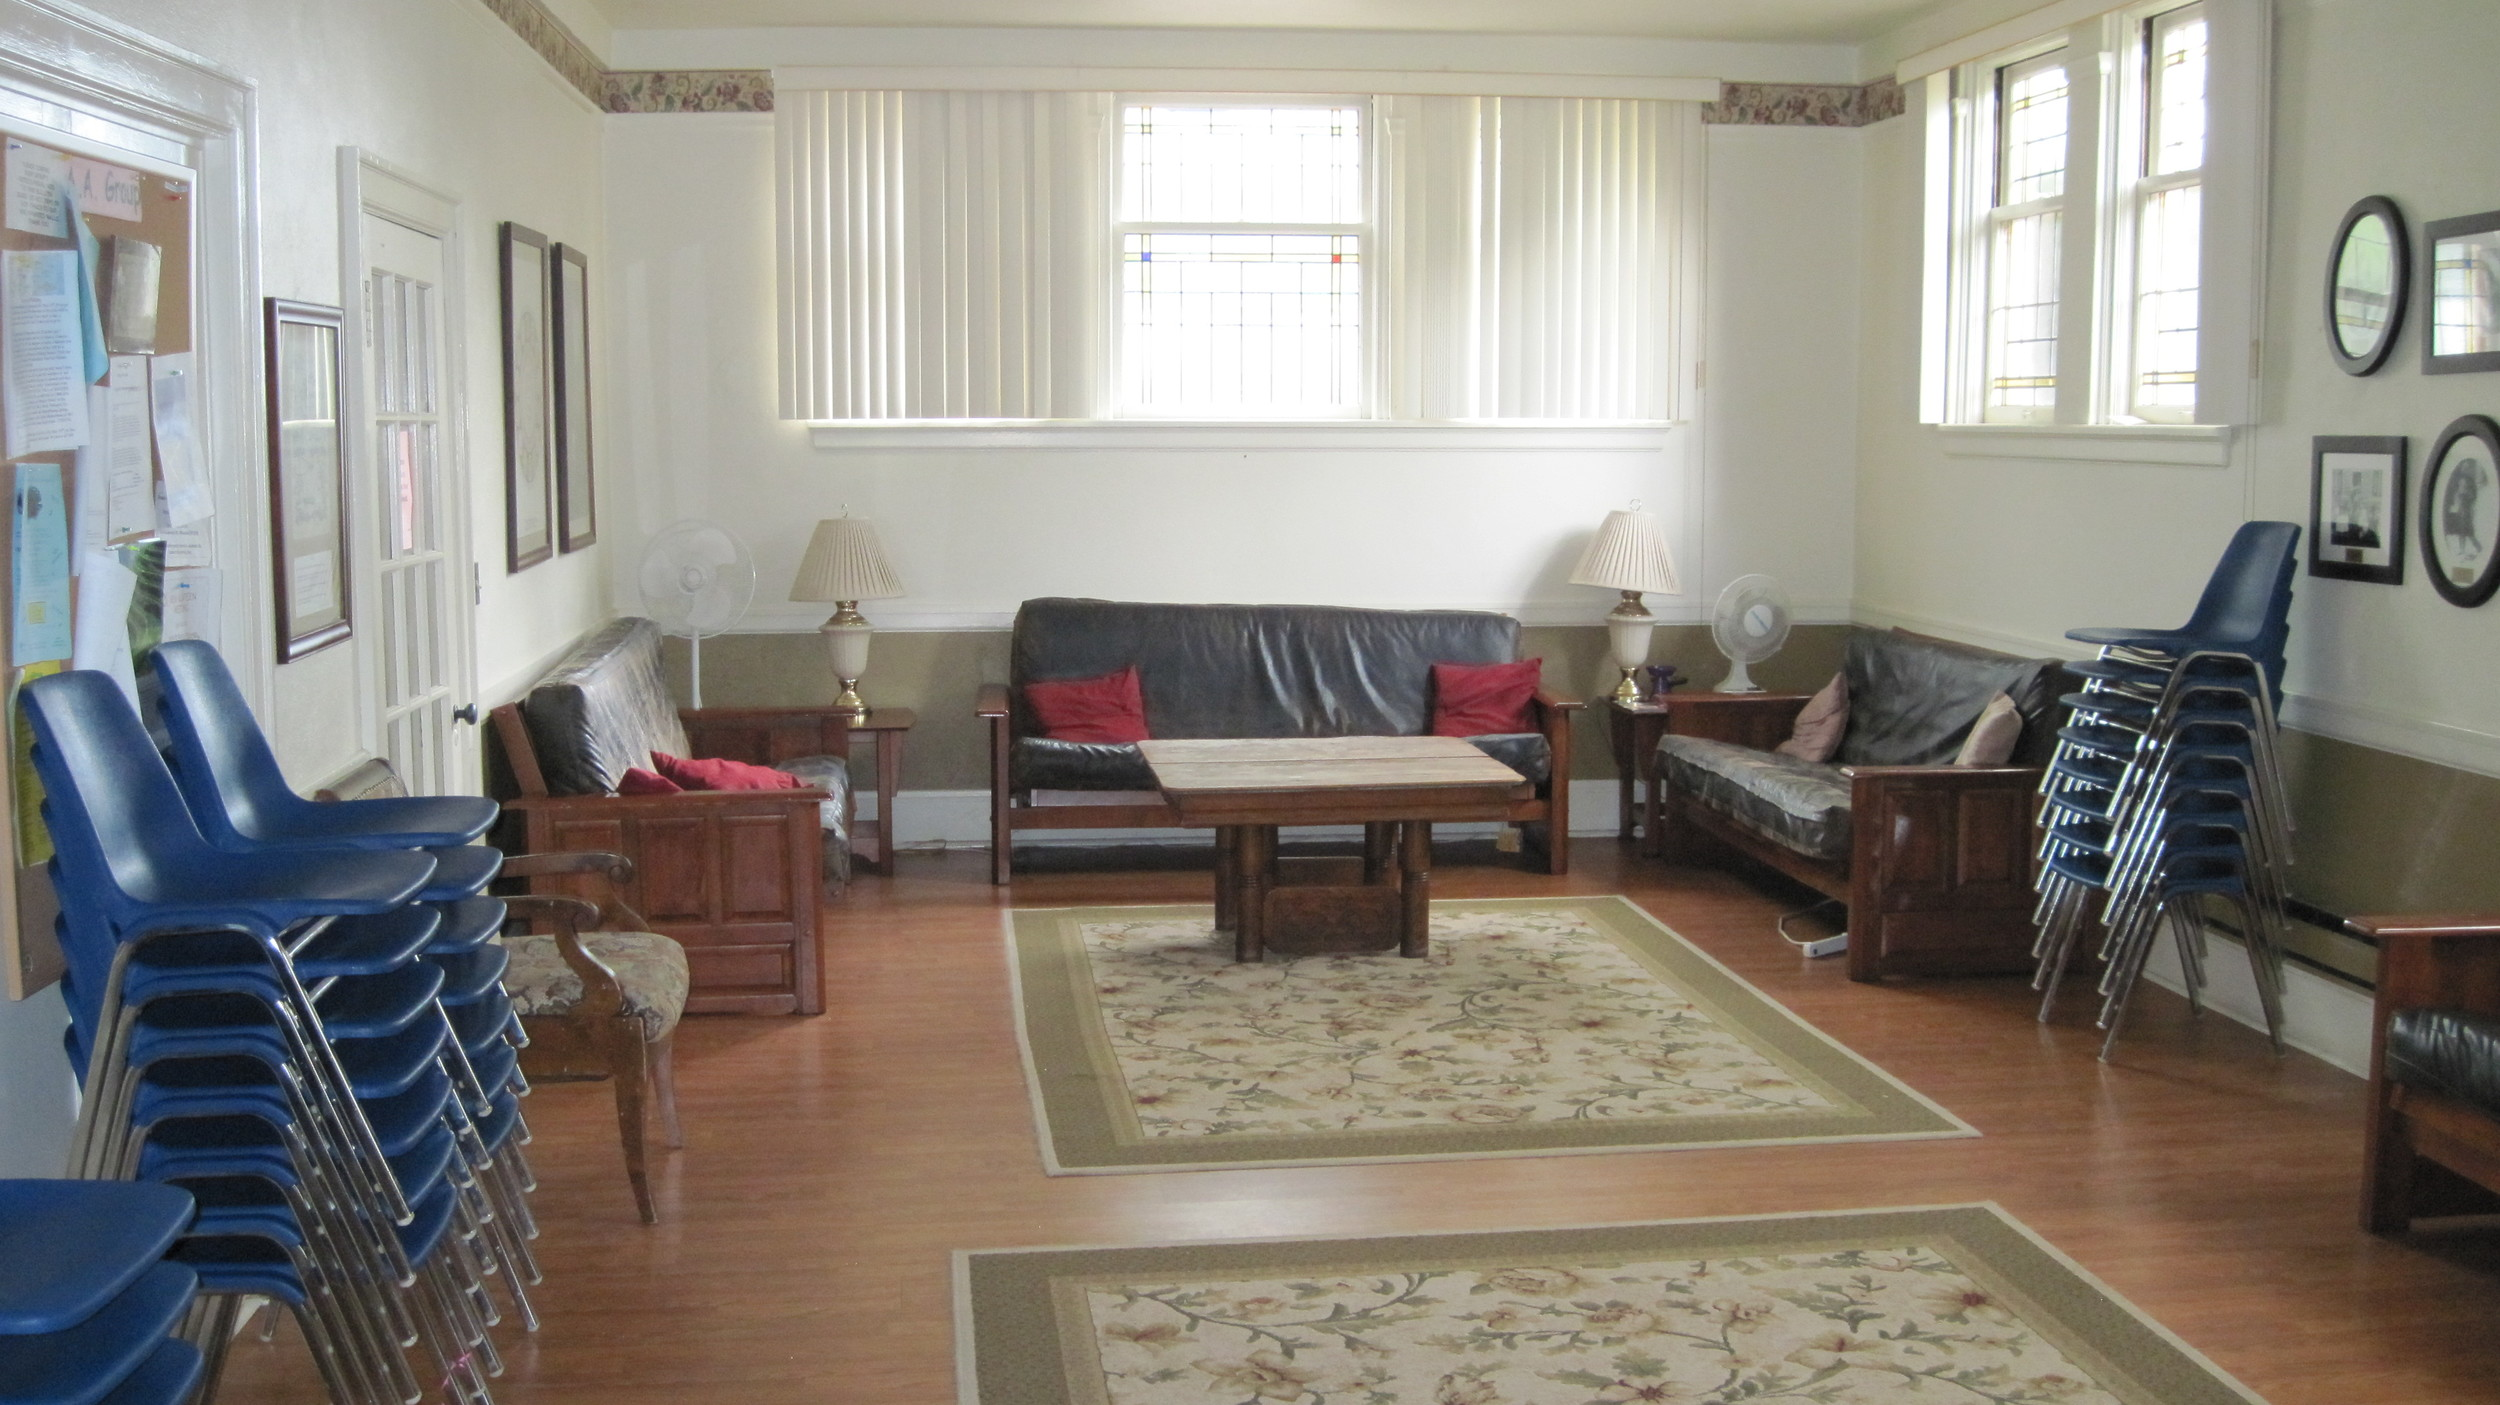 The Martha White Room